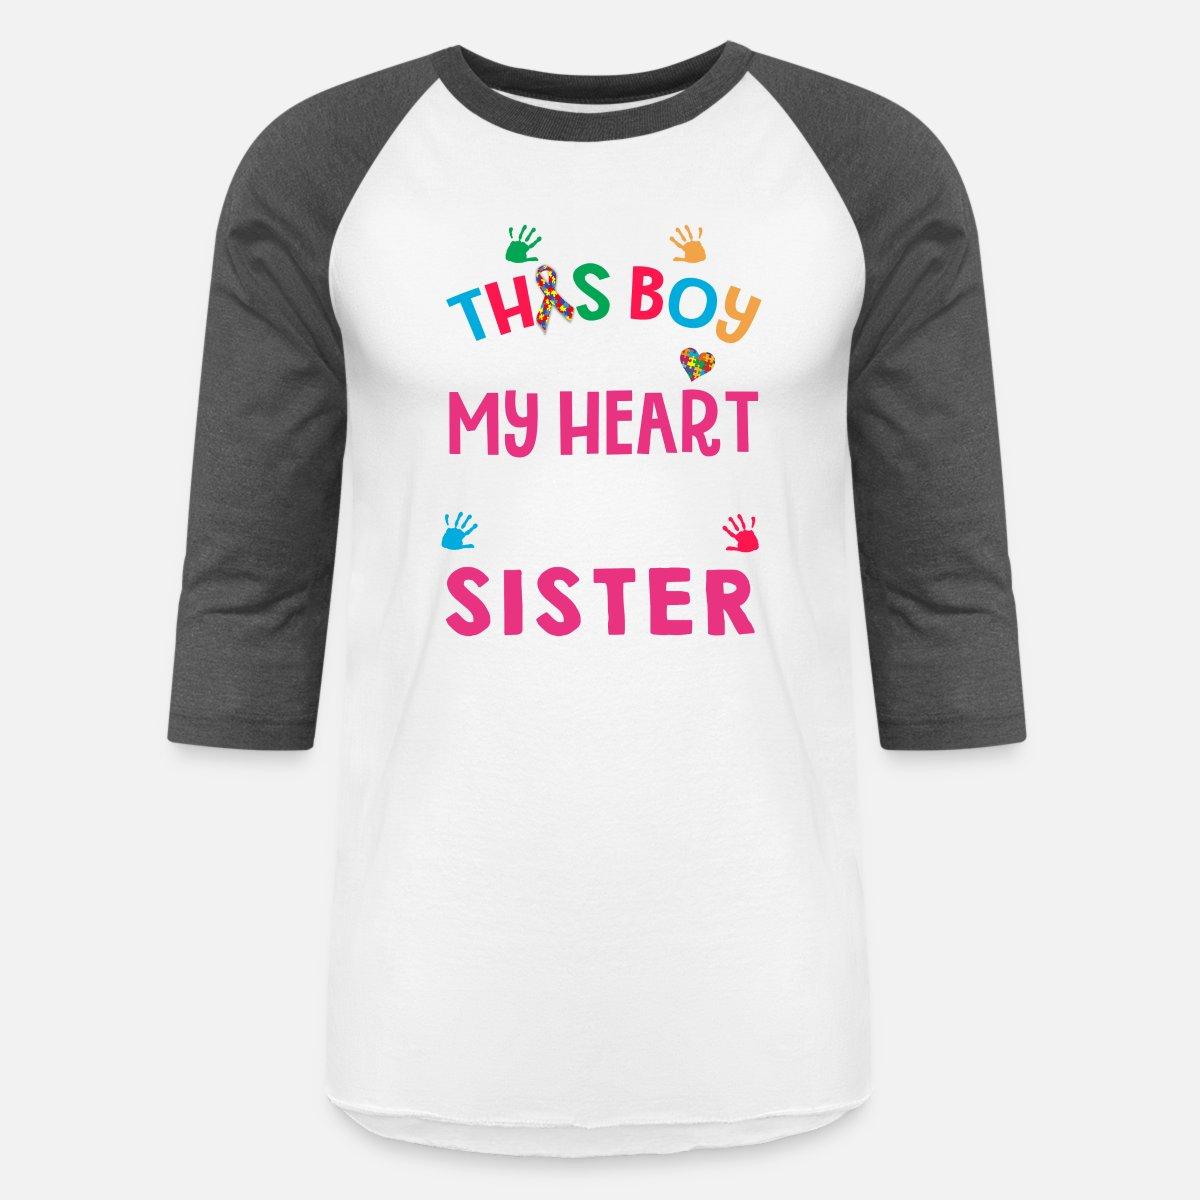 I Love This Boy He Calls Me Sister Autism Baseball T-Shirt - white/charcoal